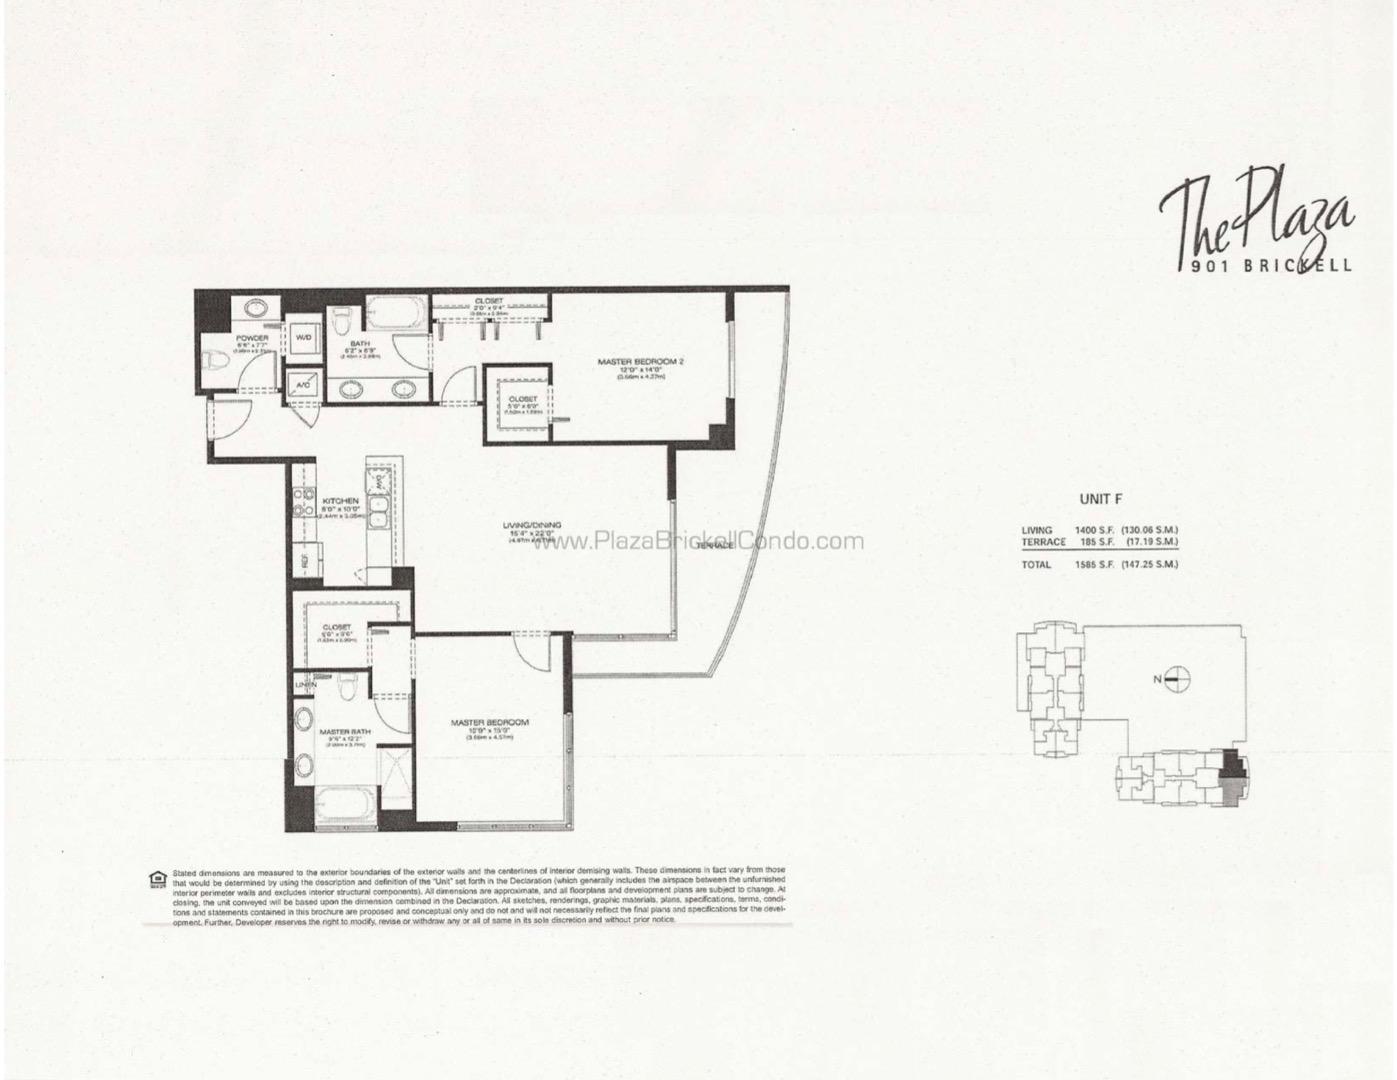 Floor plan image F - 2/2/1  - 1400 sqft image